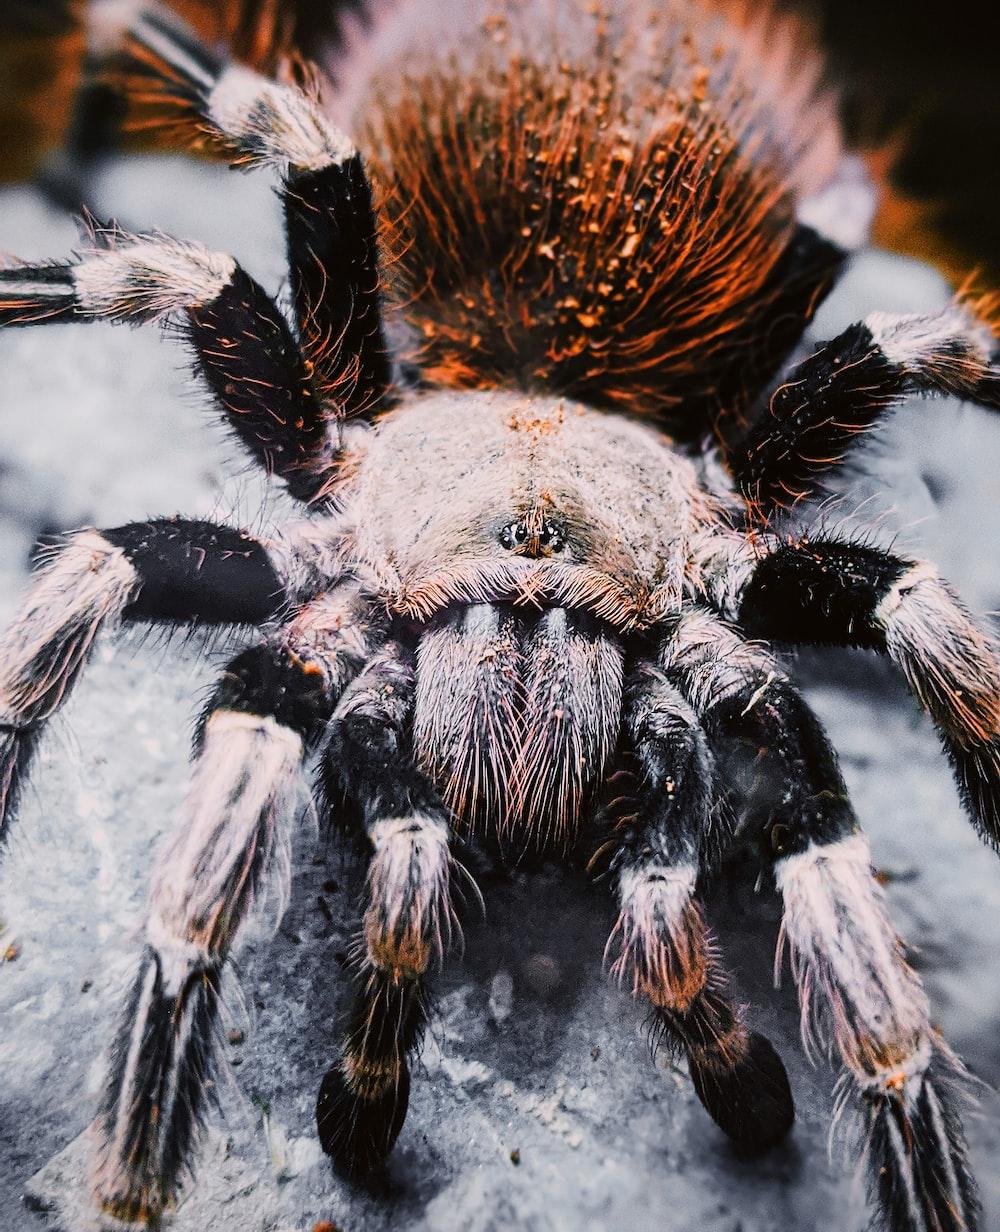 black and brown tarantula on gray surface